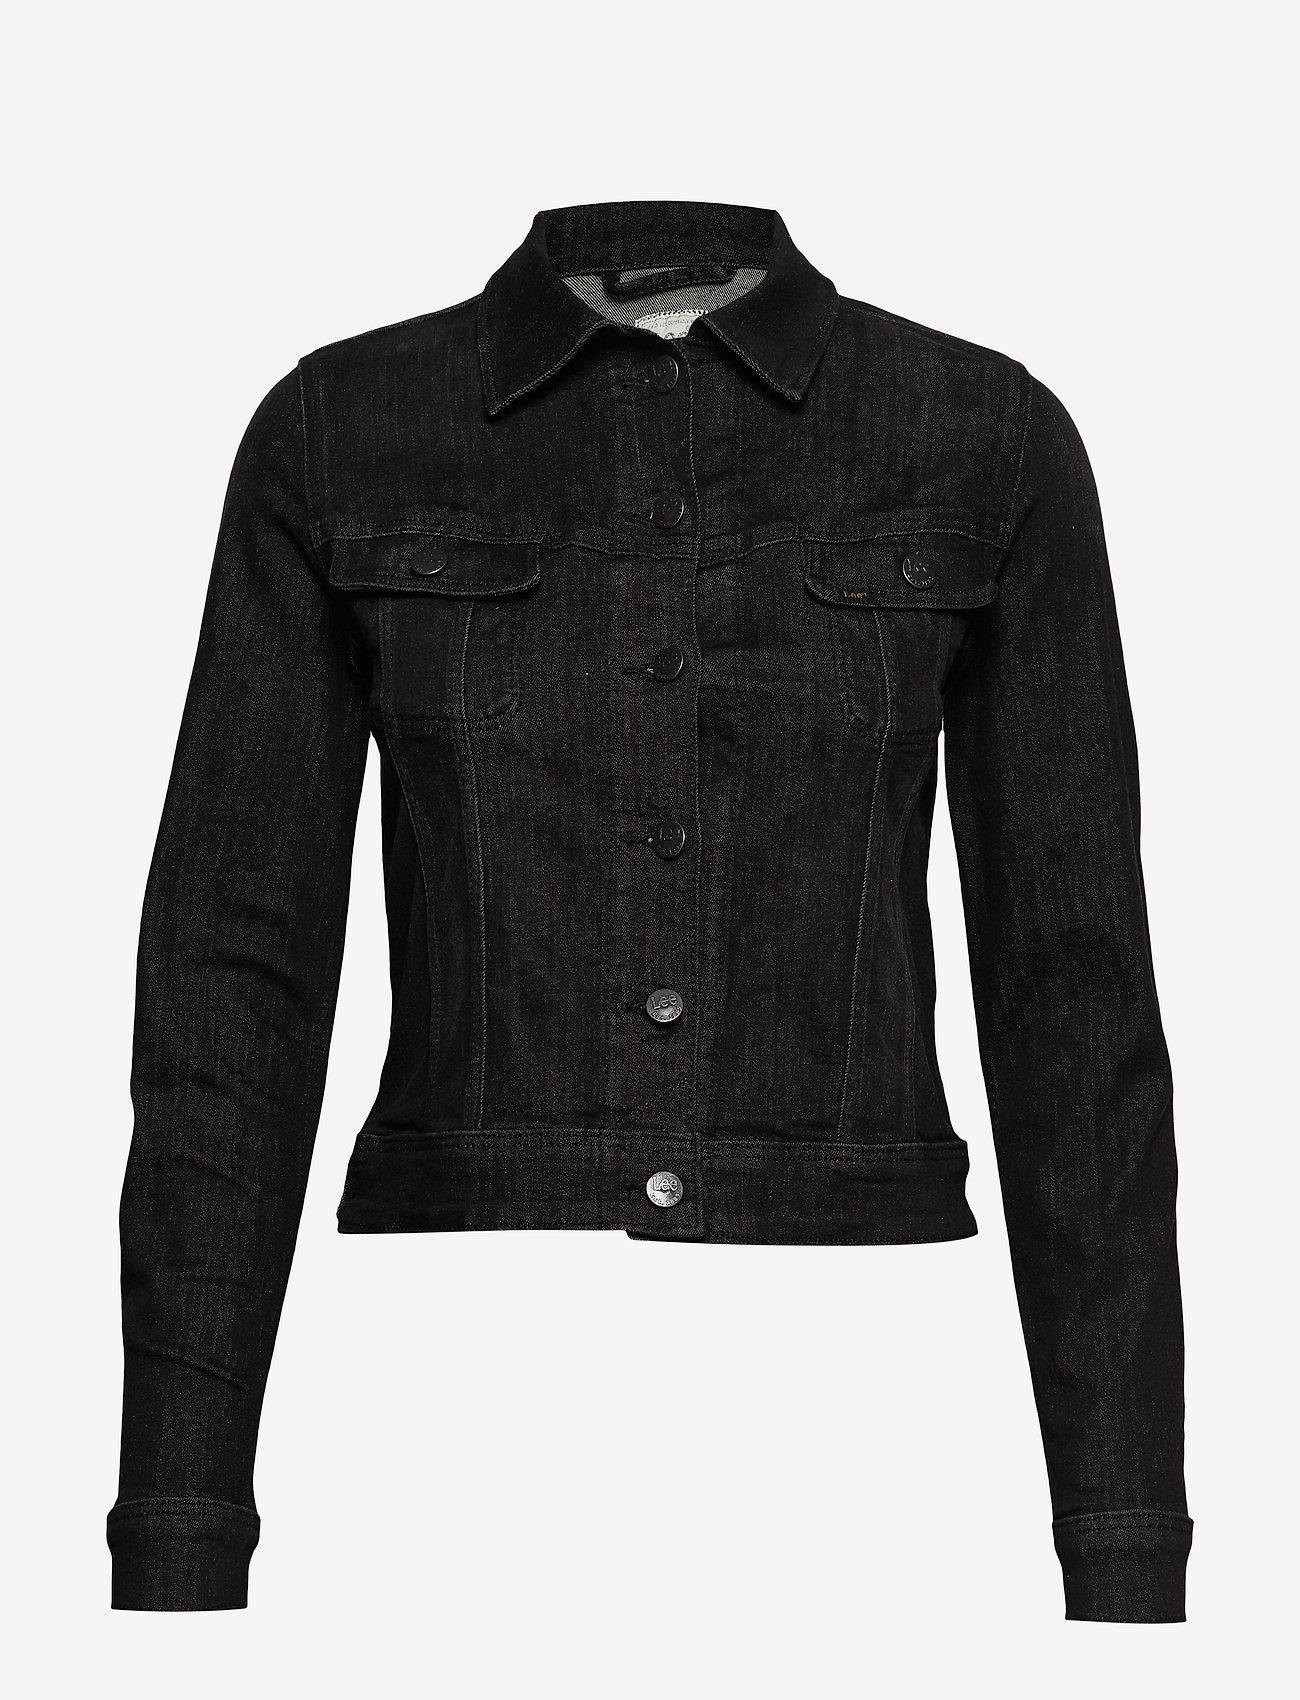 Lee Jeans - SLIM RIDER - jeansjakker - black orrick - 0